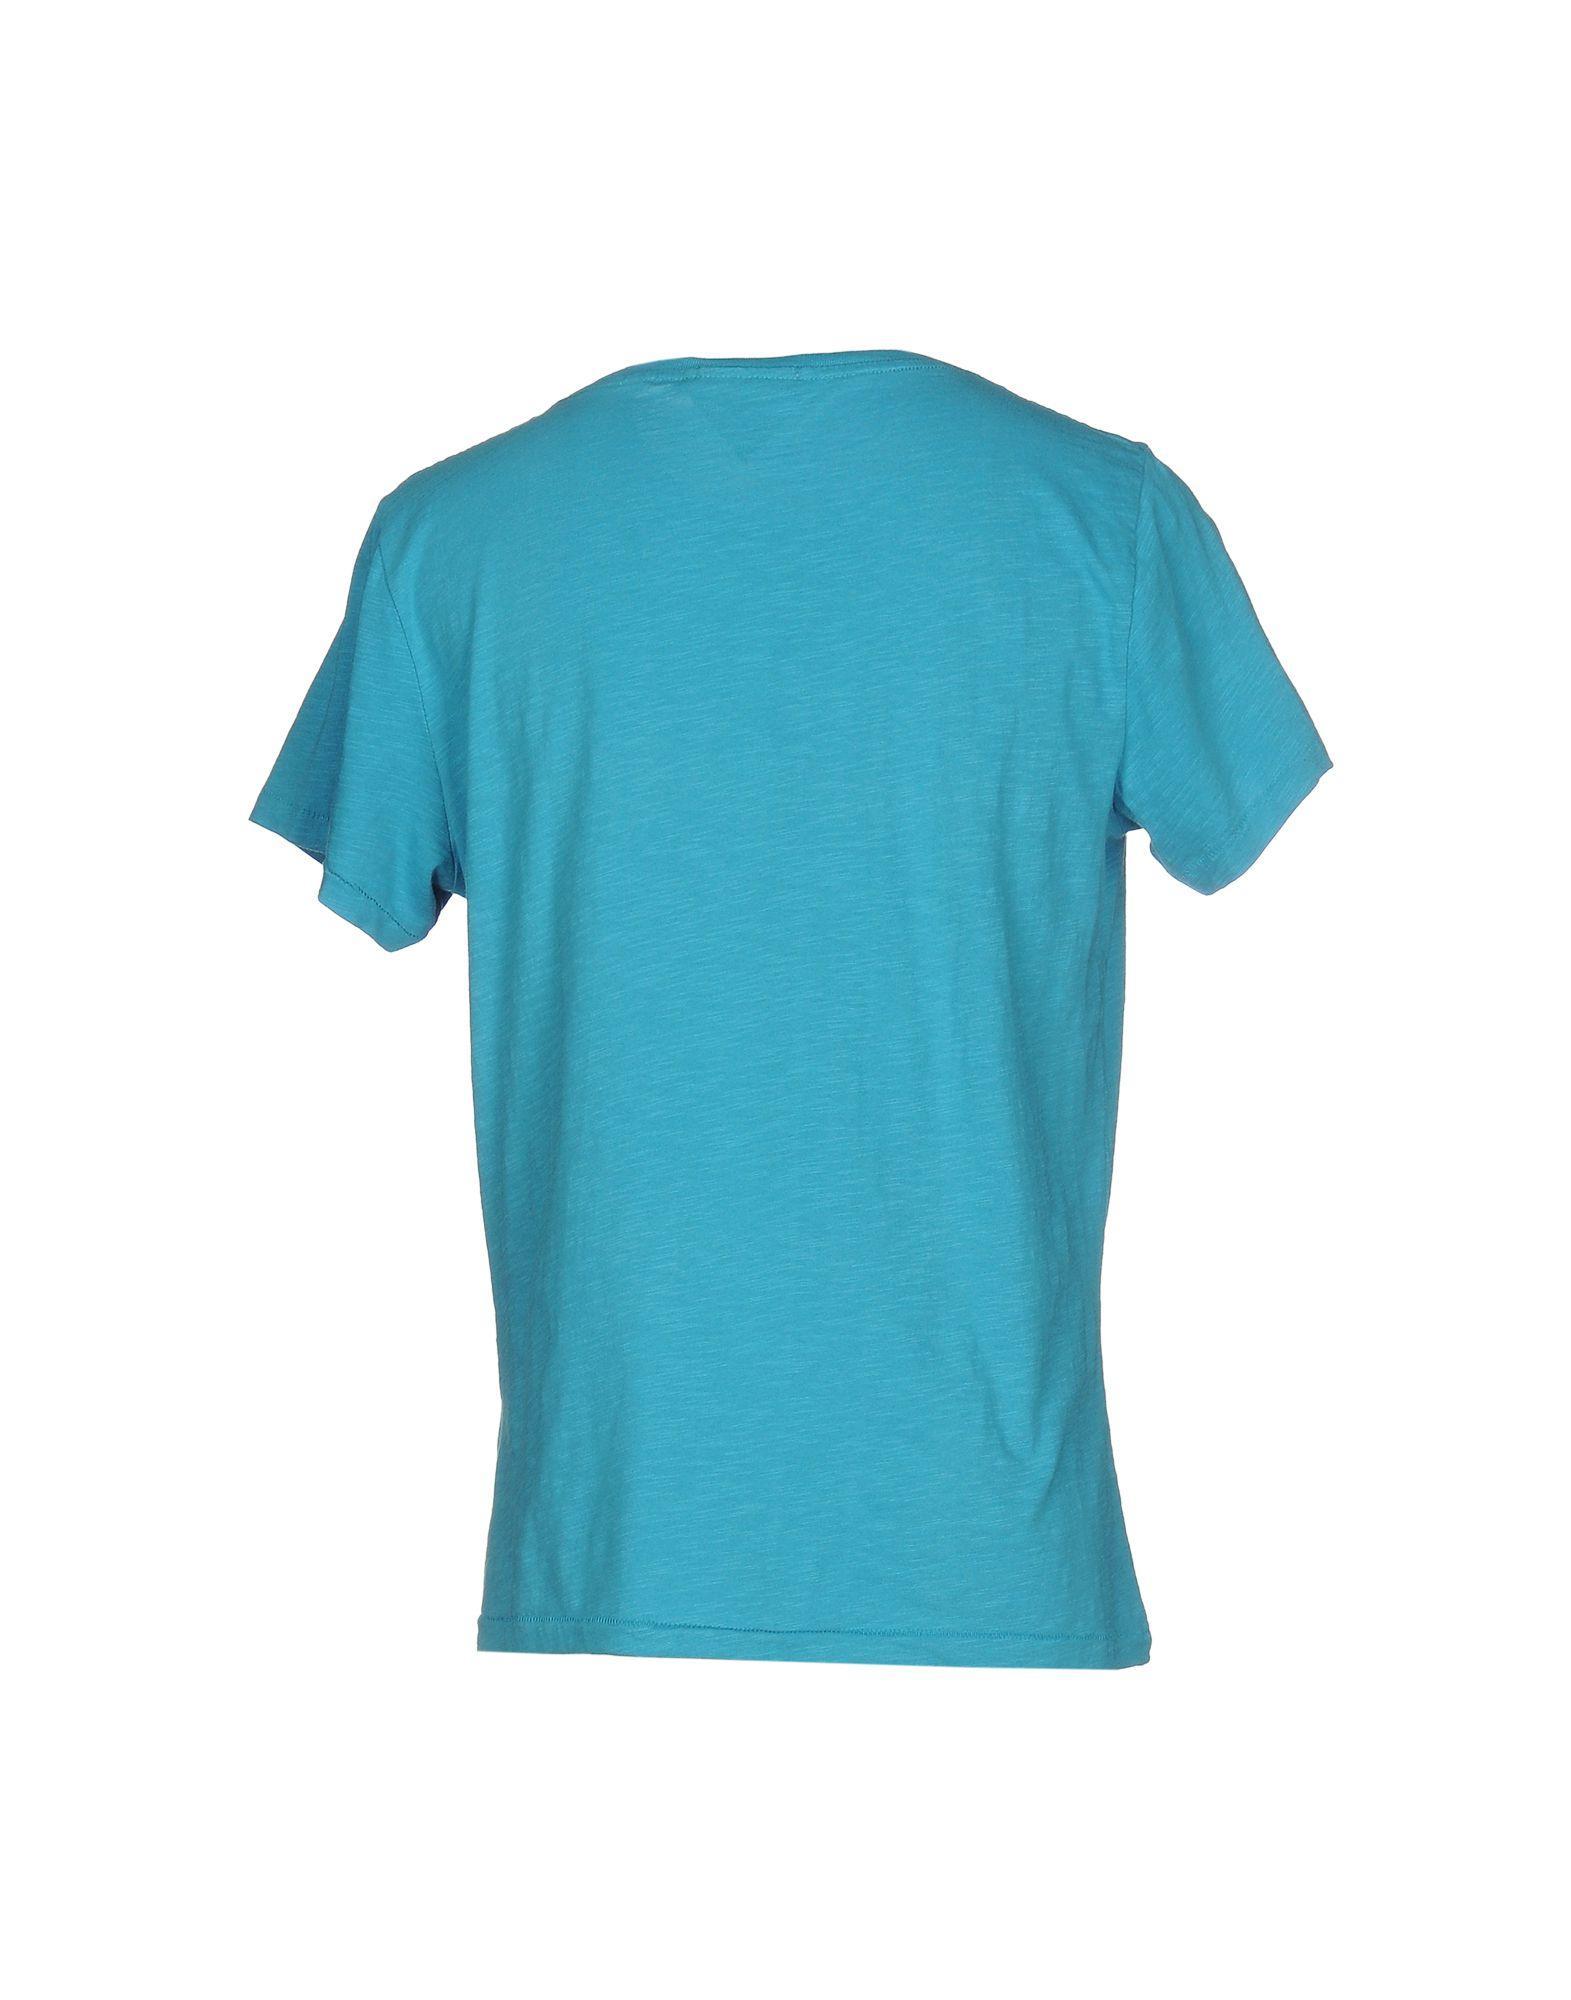 pepe jeans t shirt in blue for men lyst. Black Bedroom Furniture Sets. Home Design Ideas